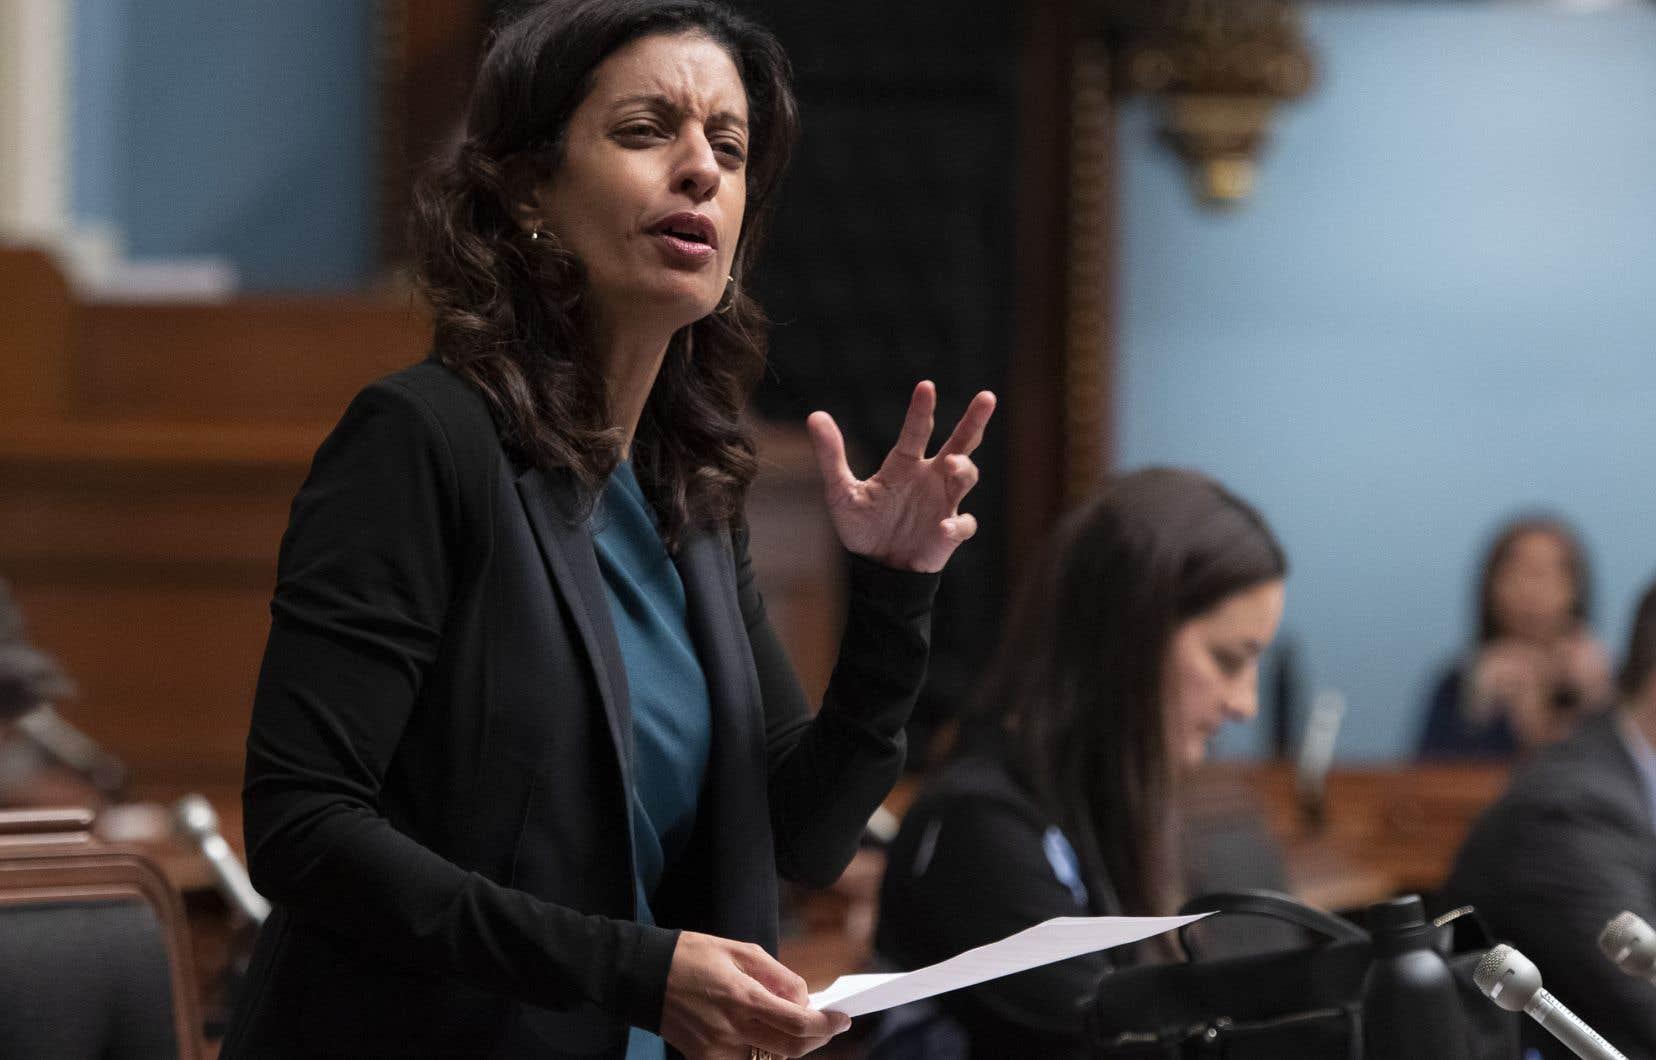 «Il en va maintenant de la paix sociale au Québec», a insisté la cheffe libérale, Dominique Anglade.